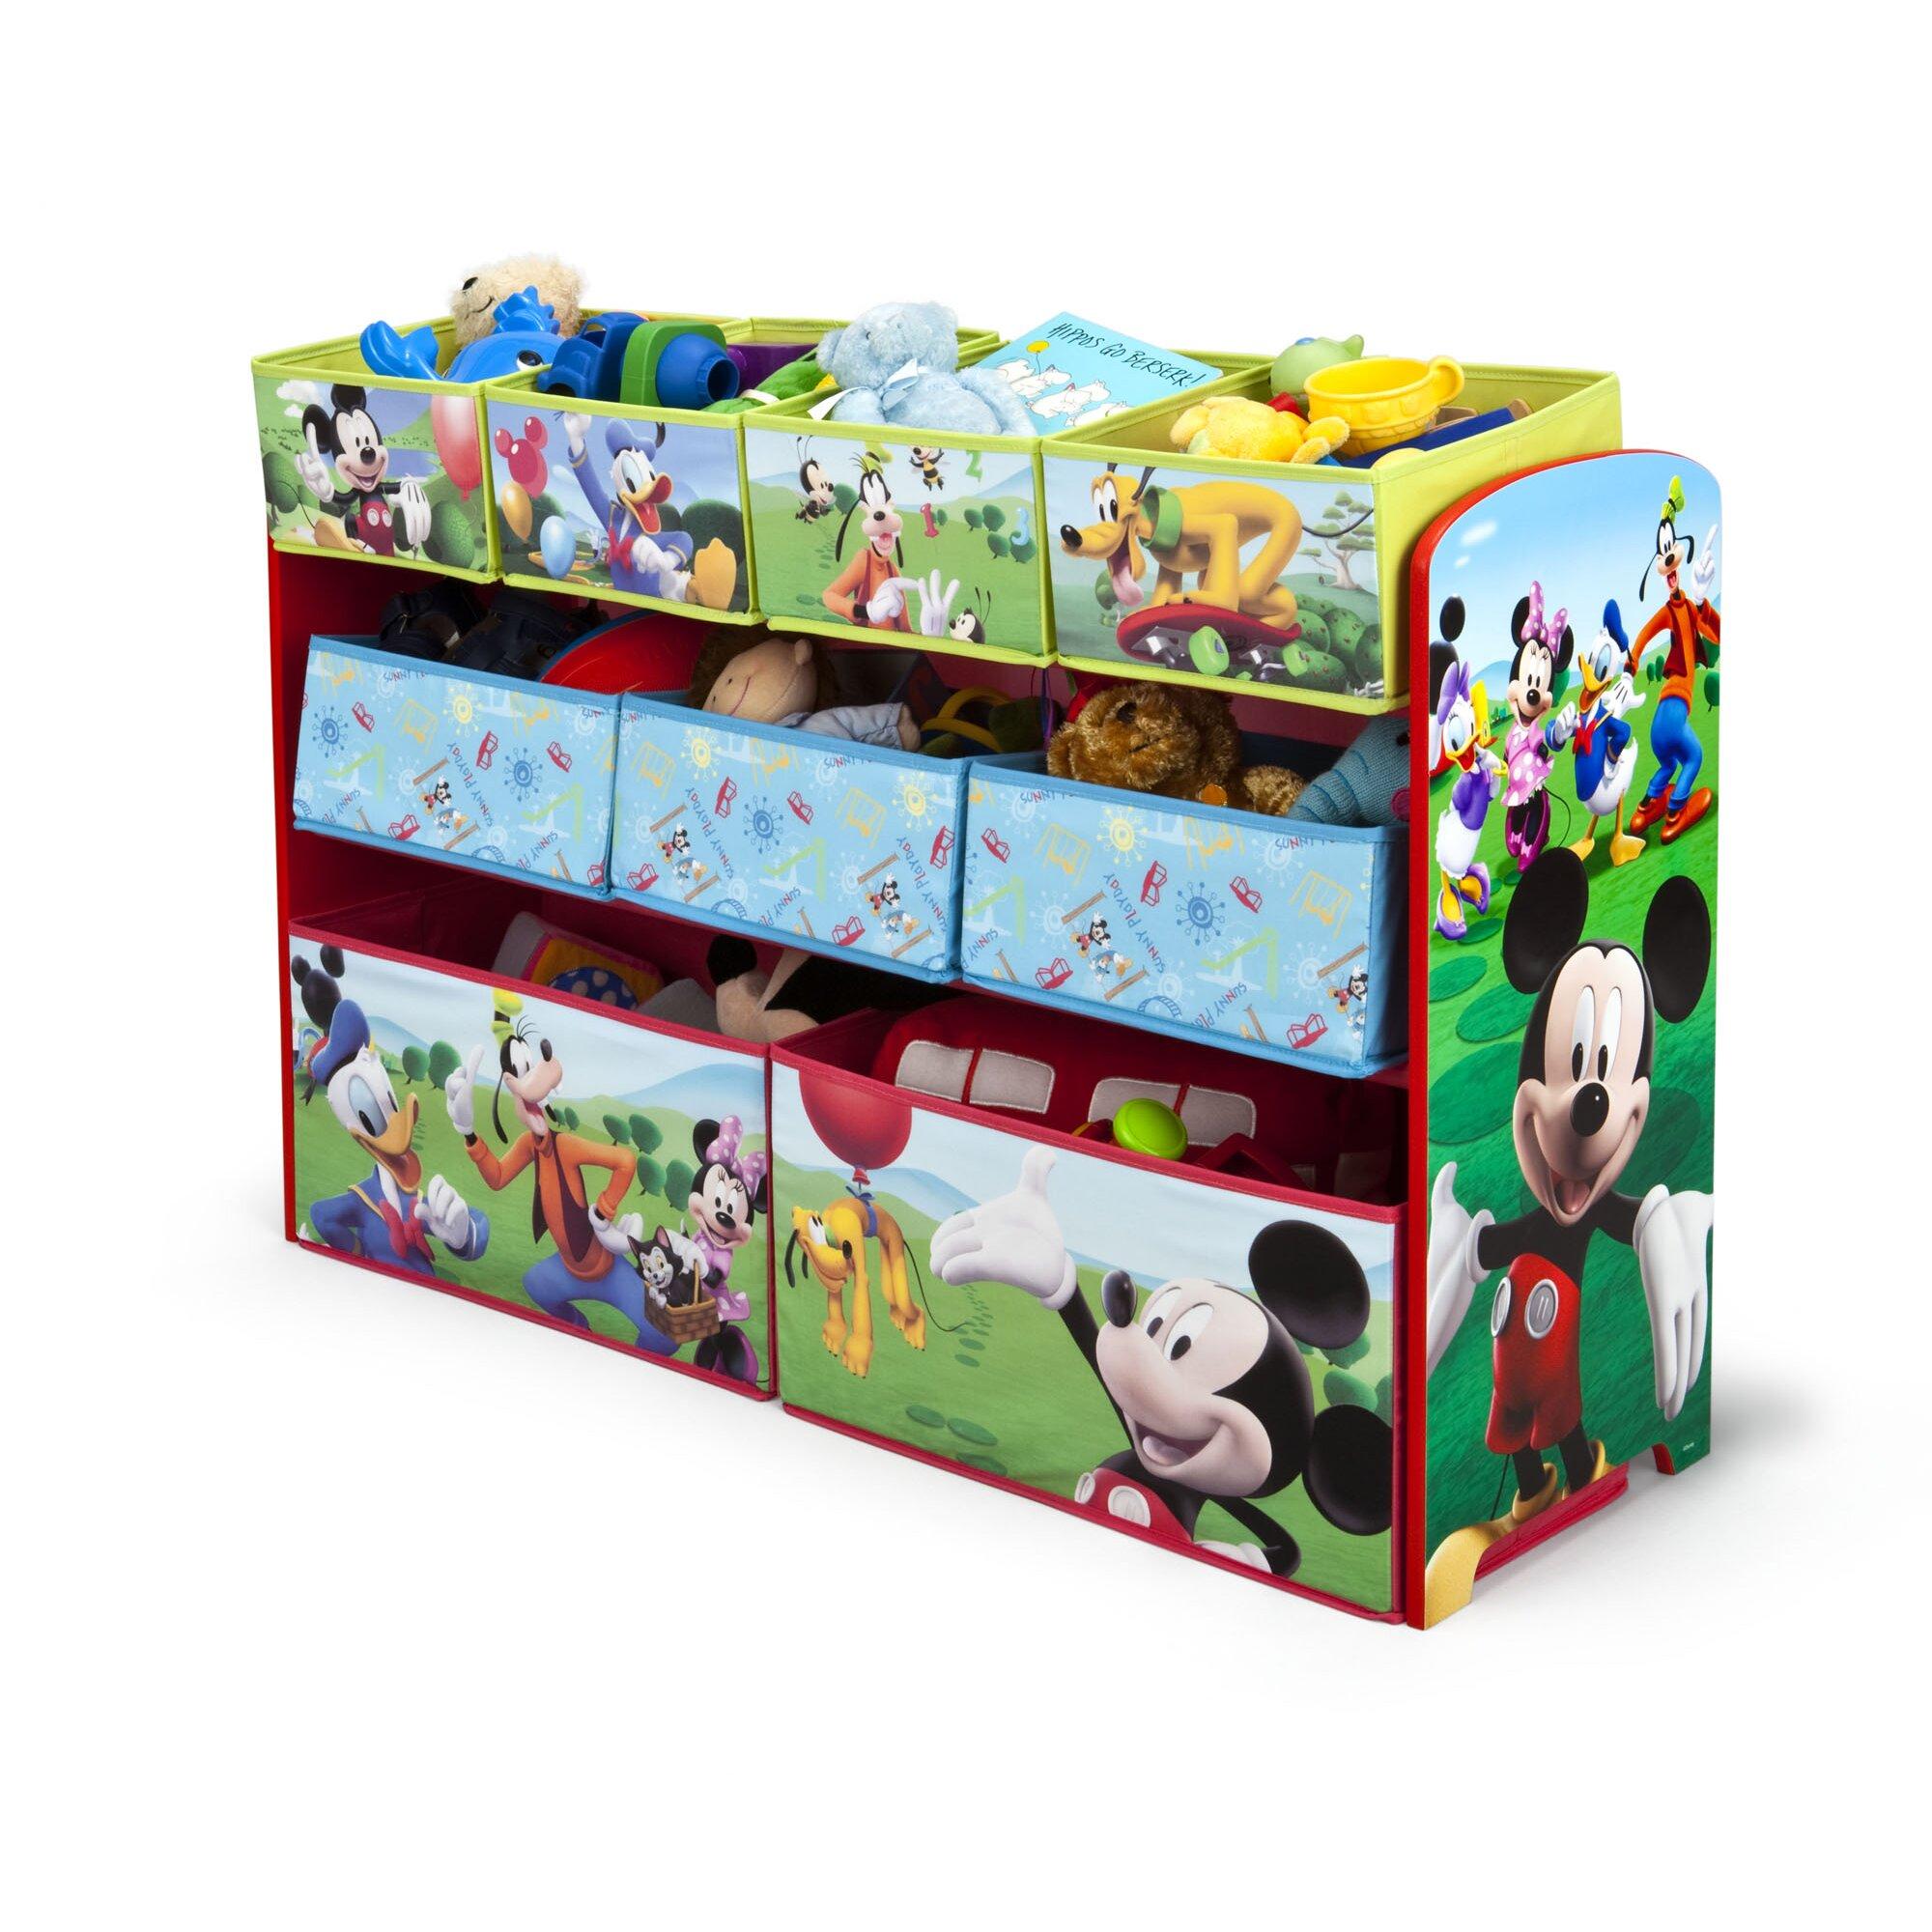 delta children disney mickey mouse toy organizer reviews. Black Bedroom Furniture Sets. Home Design Ideas